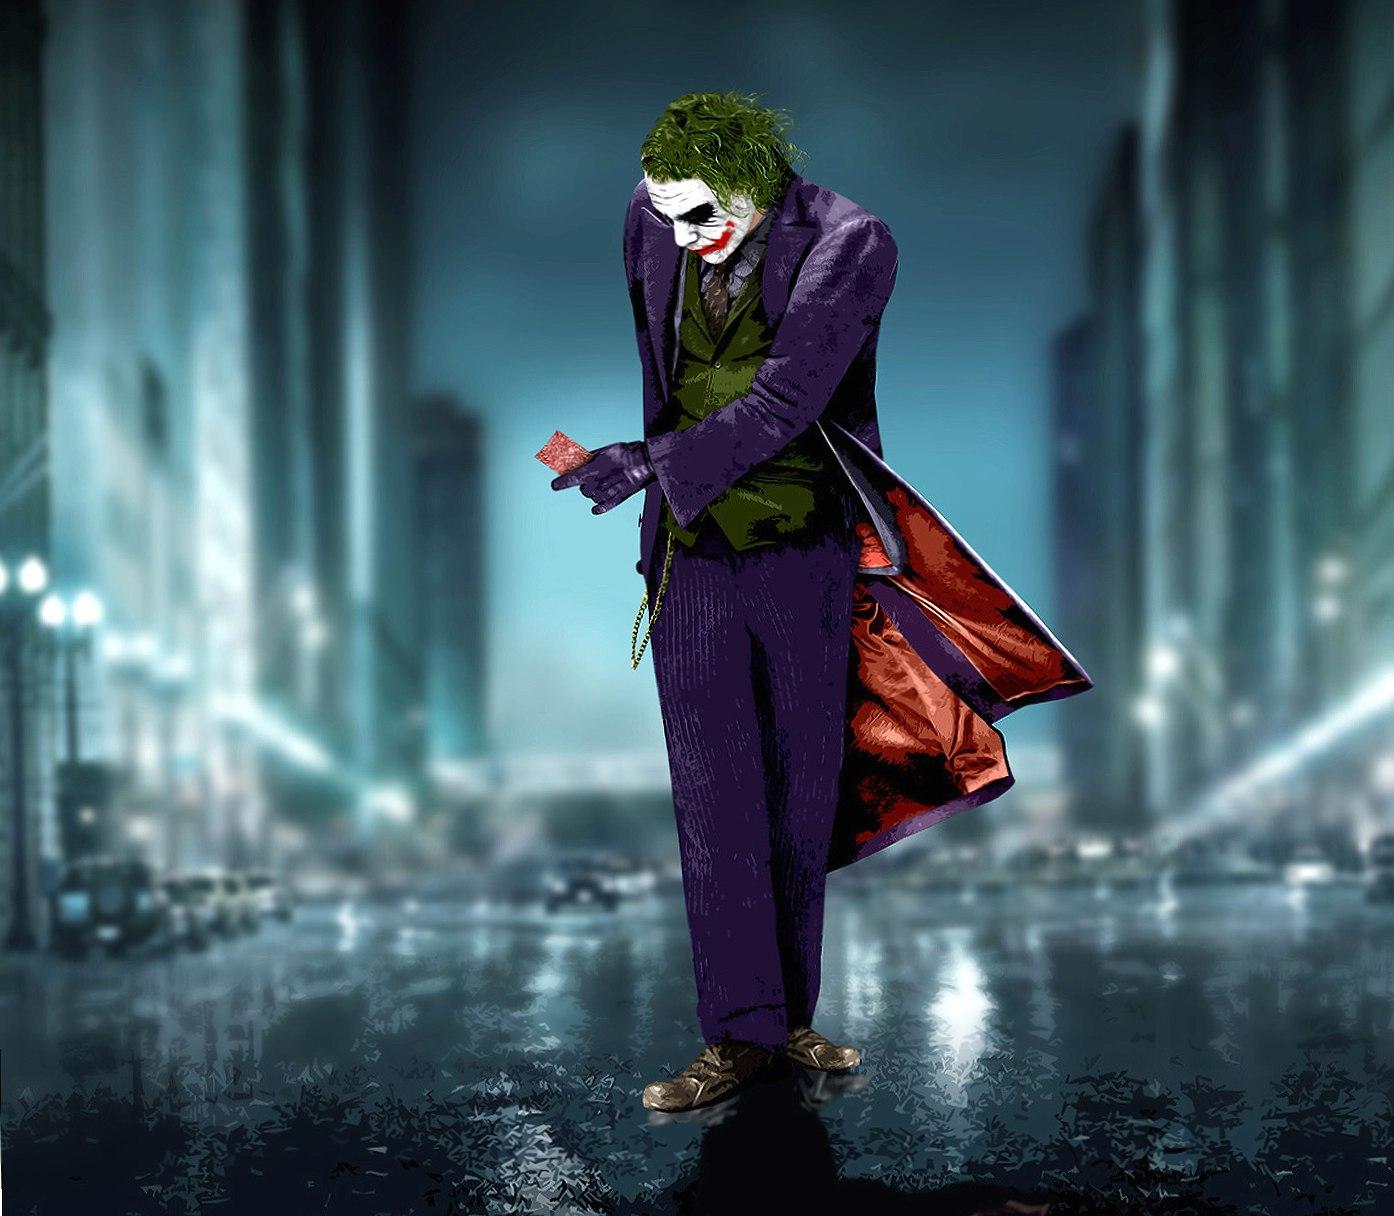 Joker wallpapers HD quality